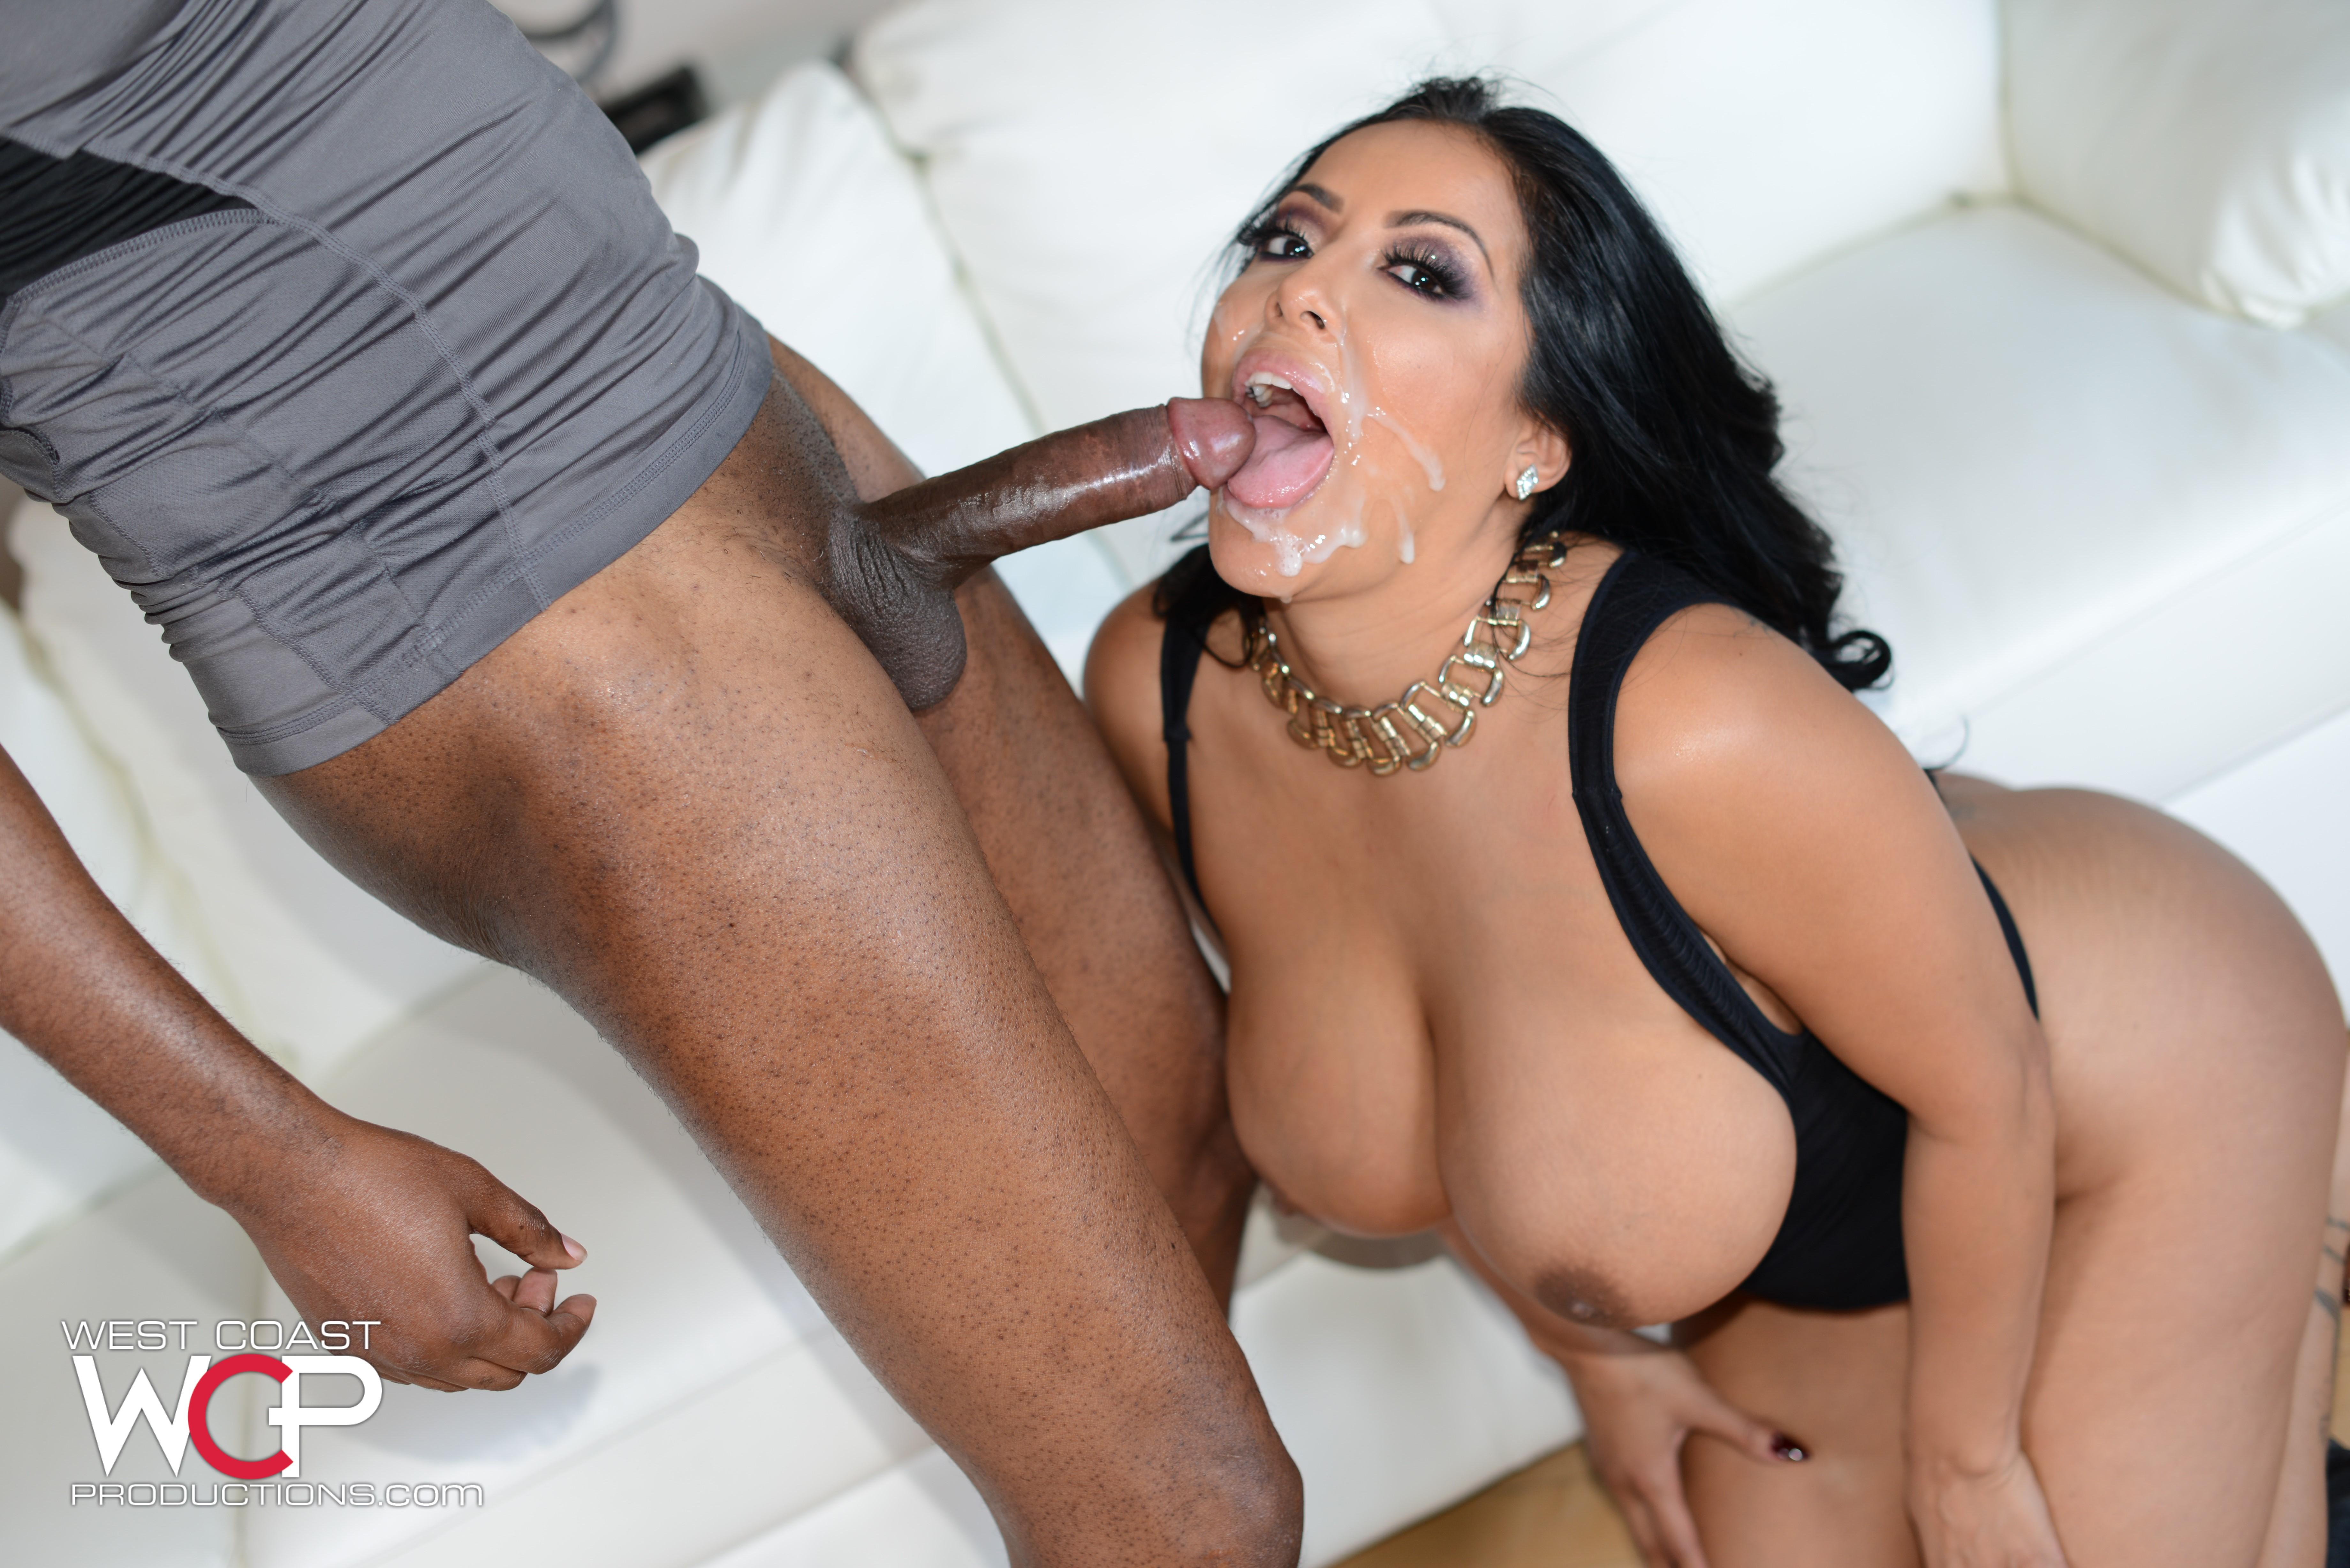 Westcoast production latina porn